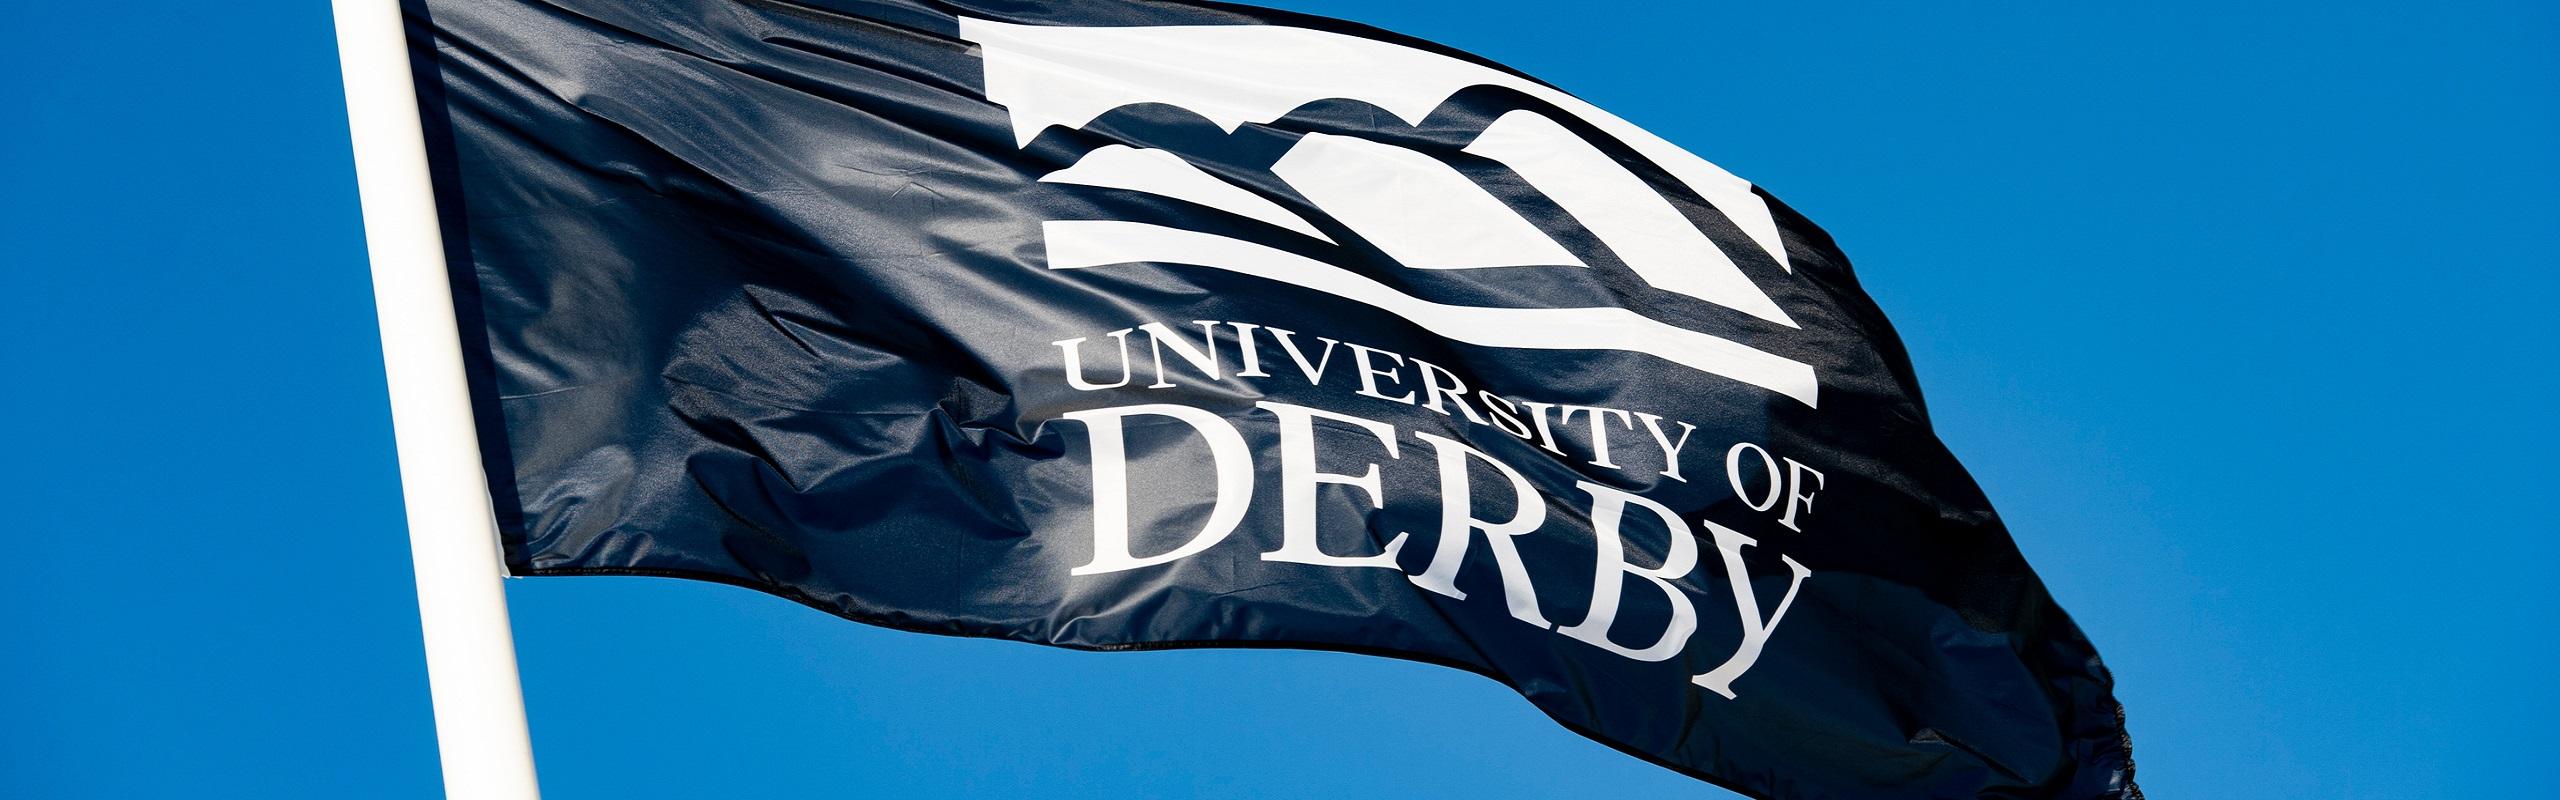 University of Derby flag